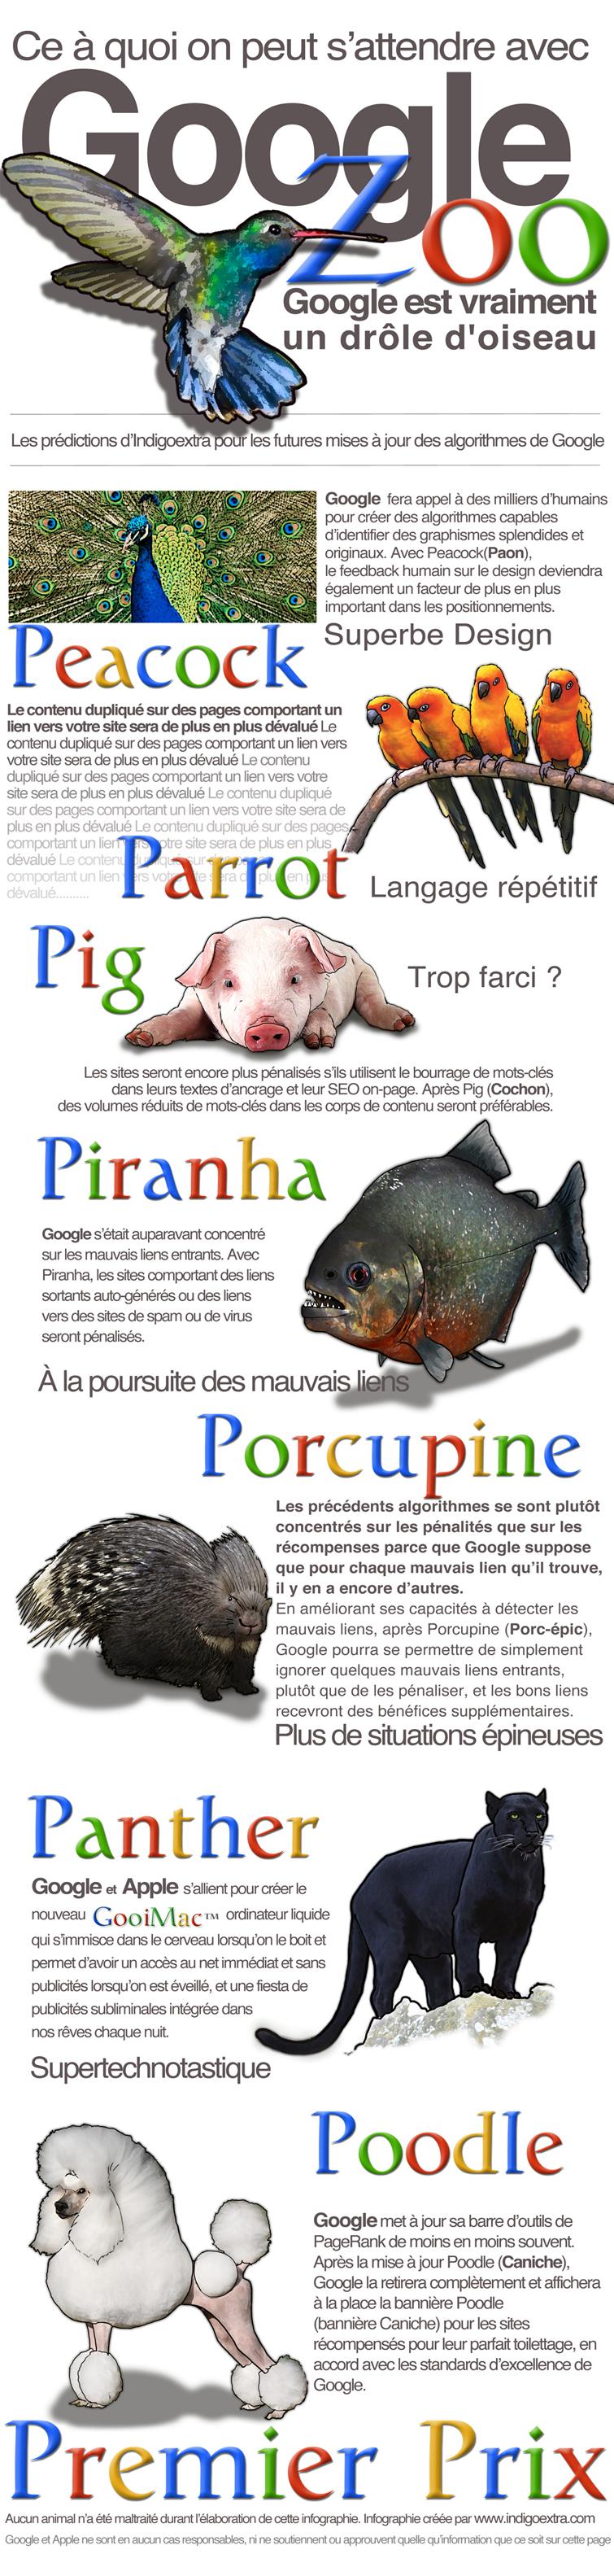 Infographie Google Zoo